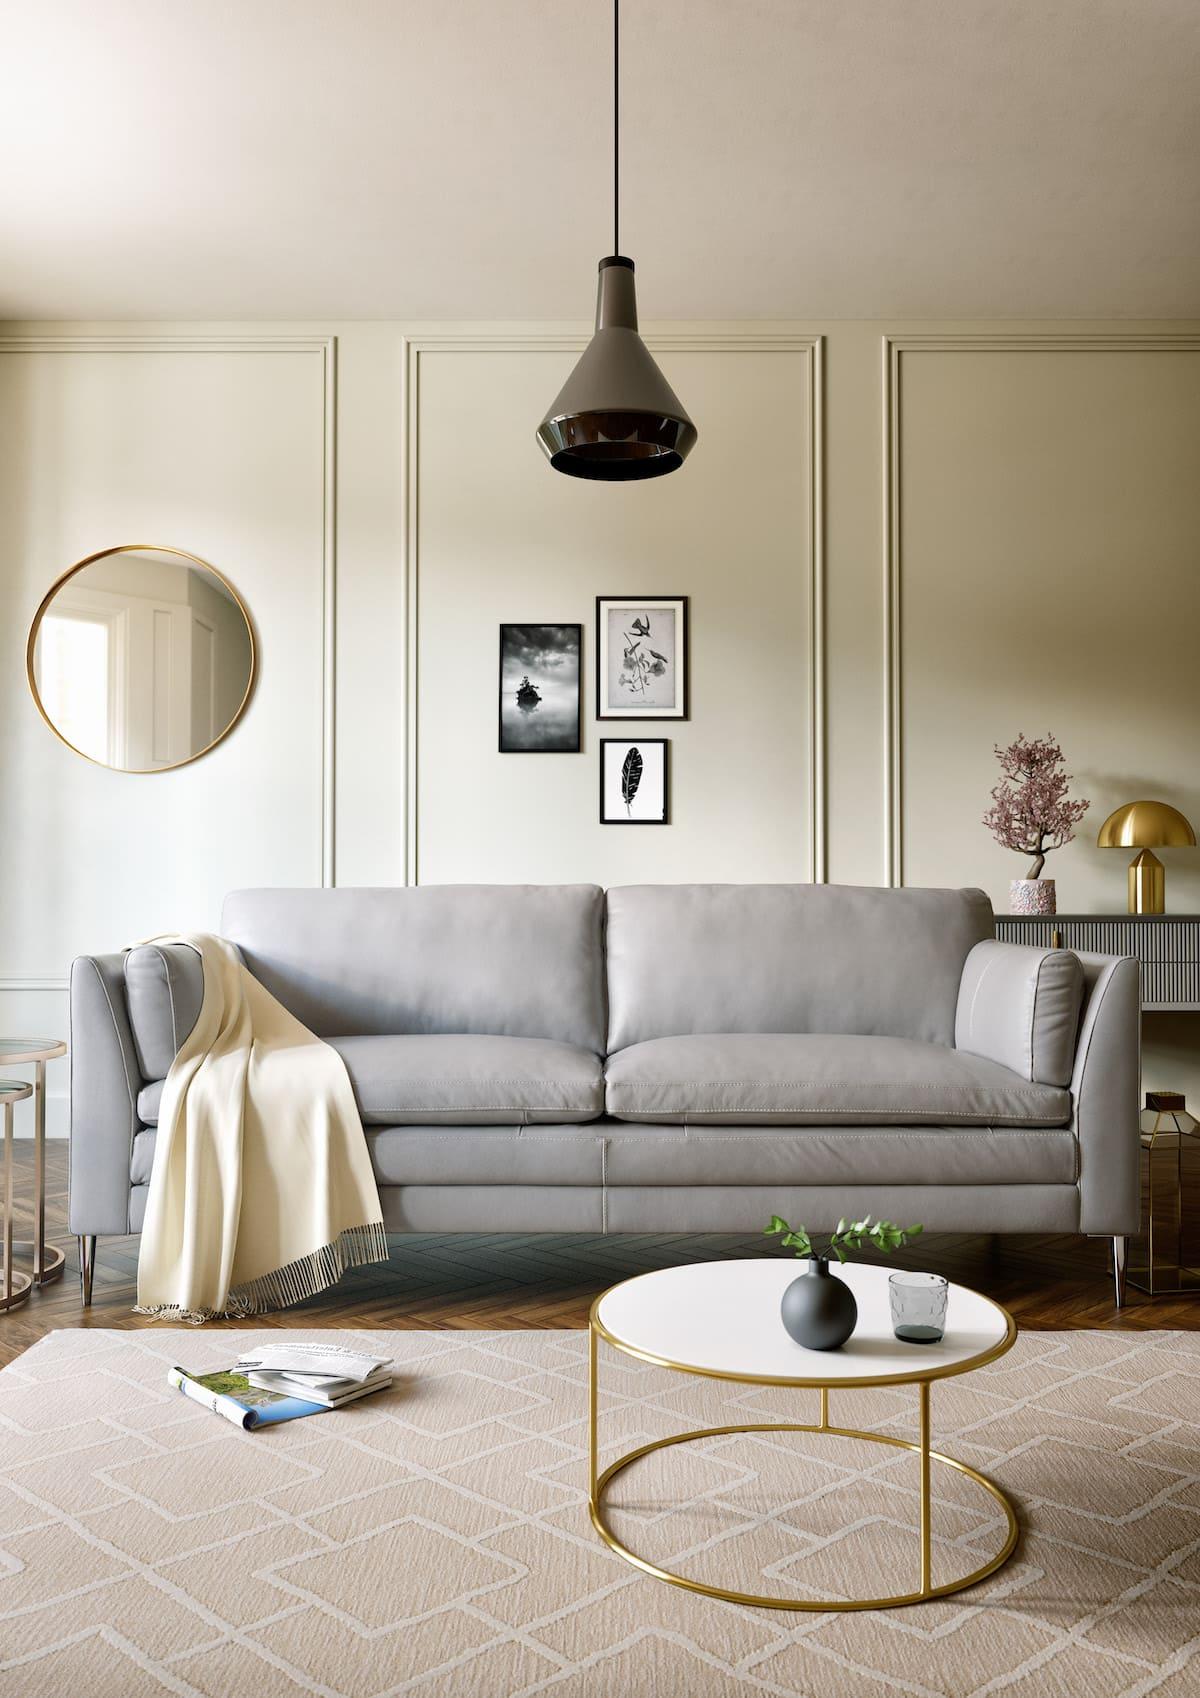 дизайн интерьера модной квартиры фото 16